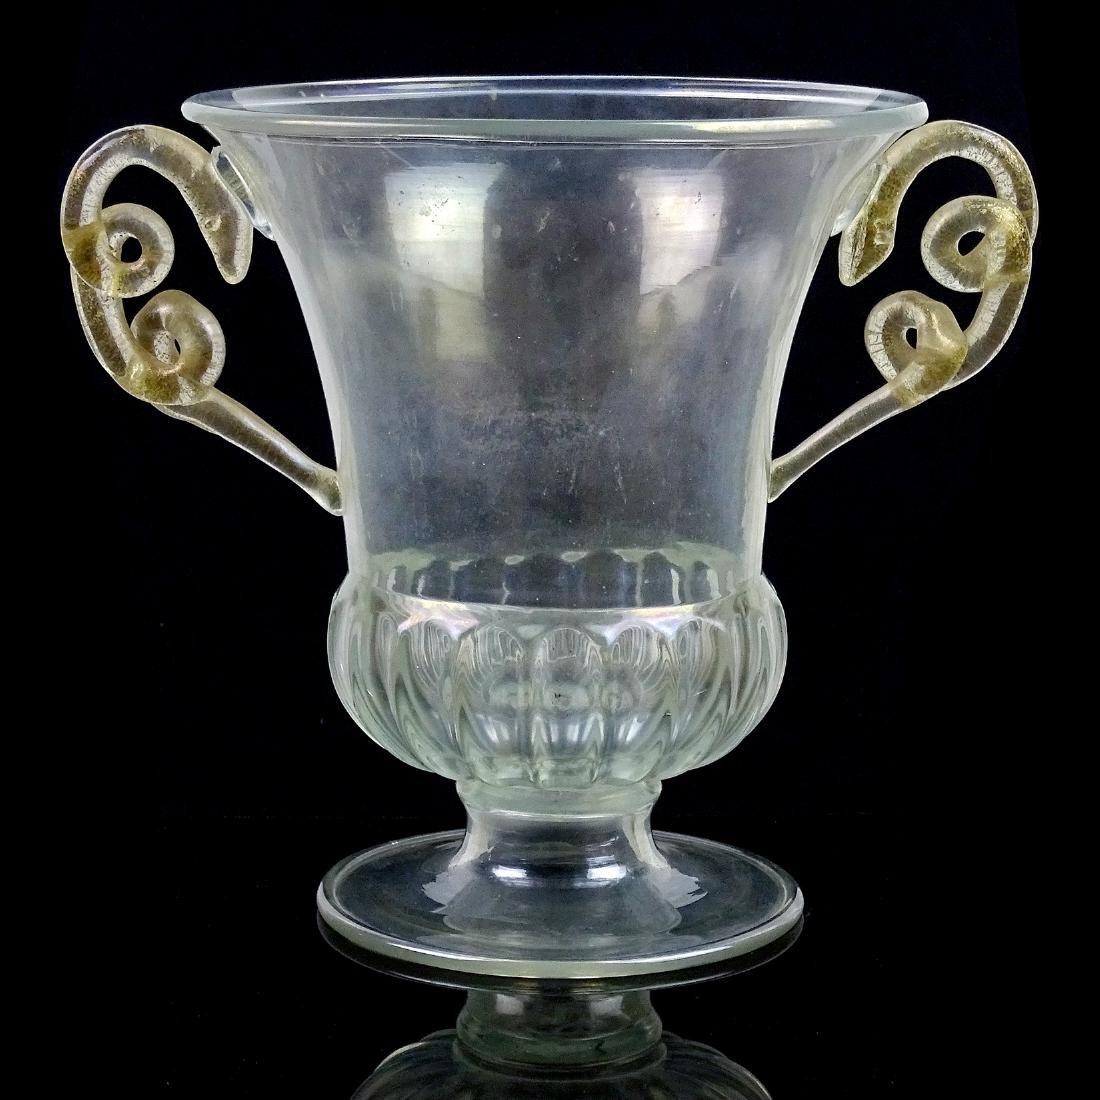 Paolo Venini Murano Iridescent Gold Snakes Trophy Vase